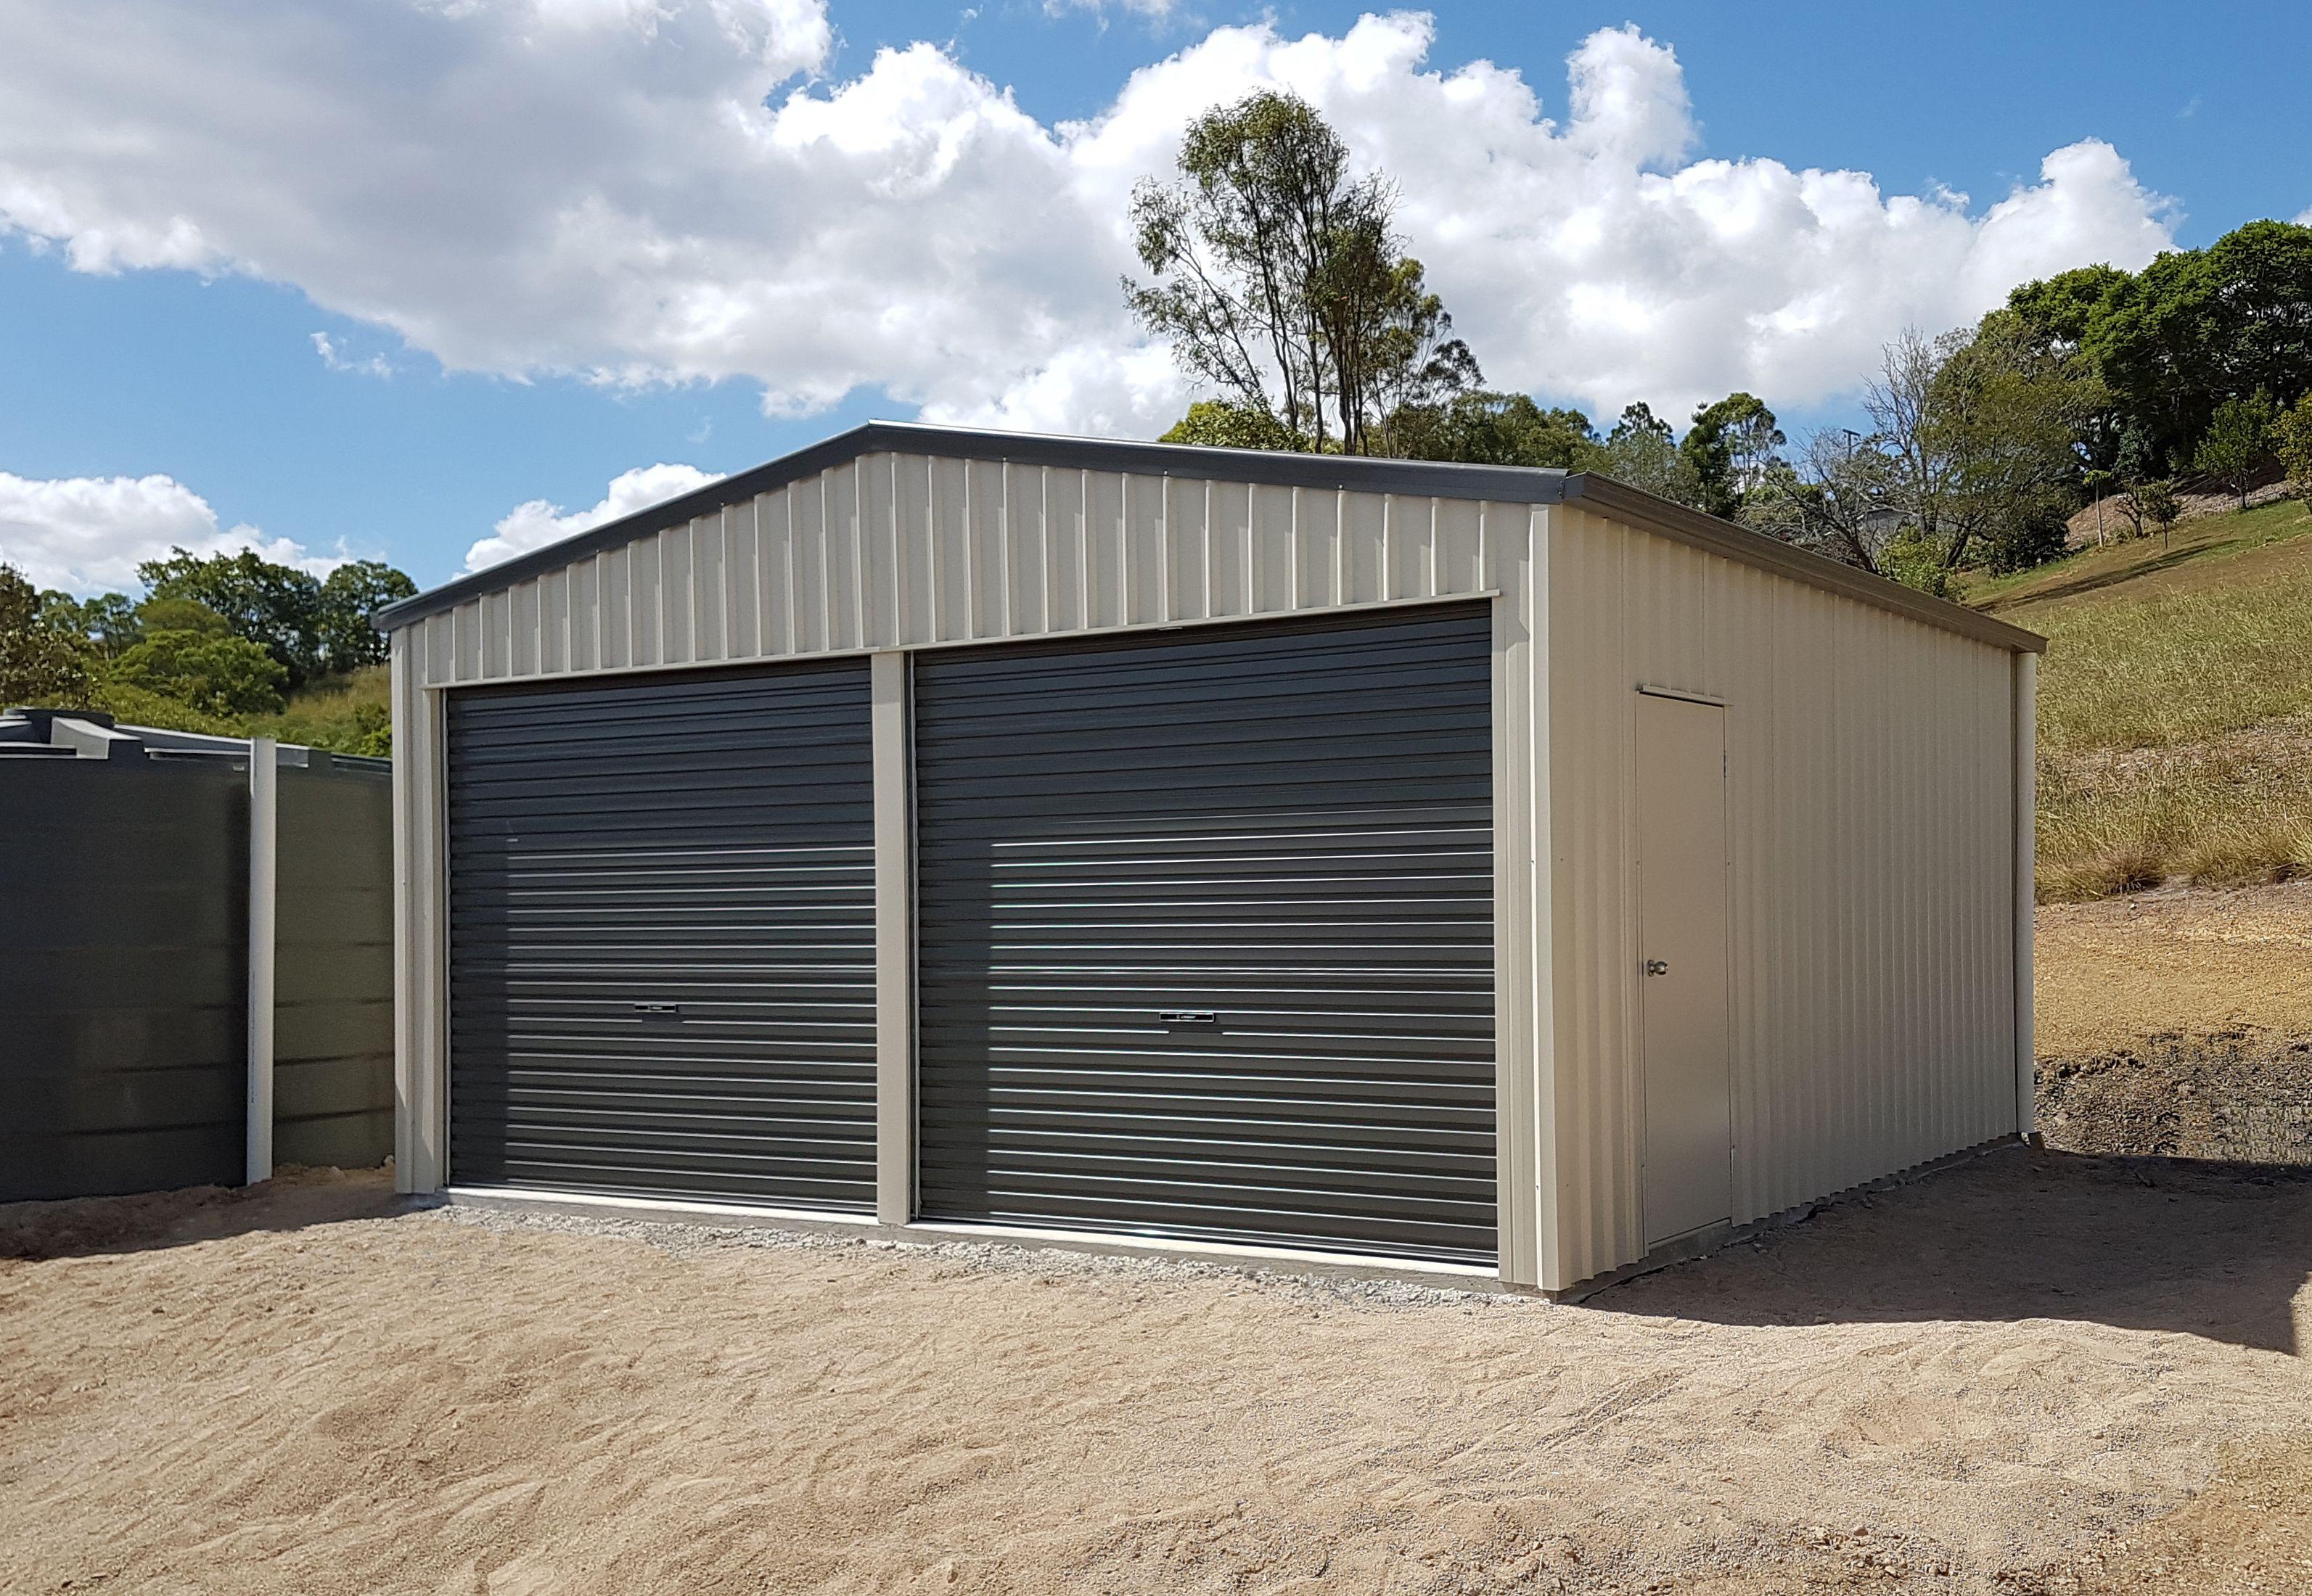 Double Garage Shed Shed, Garage, Garage shed